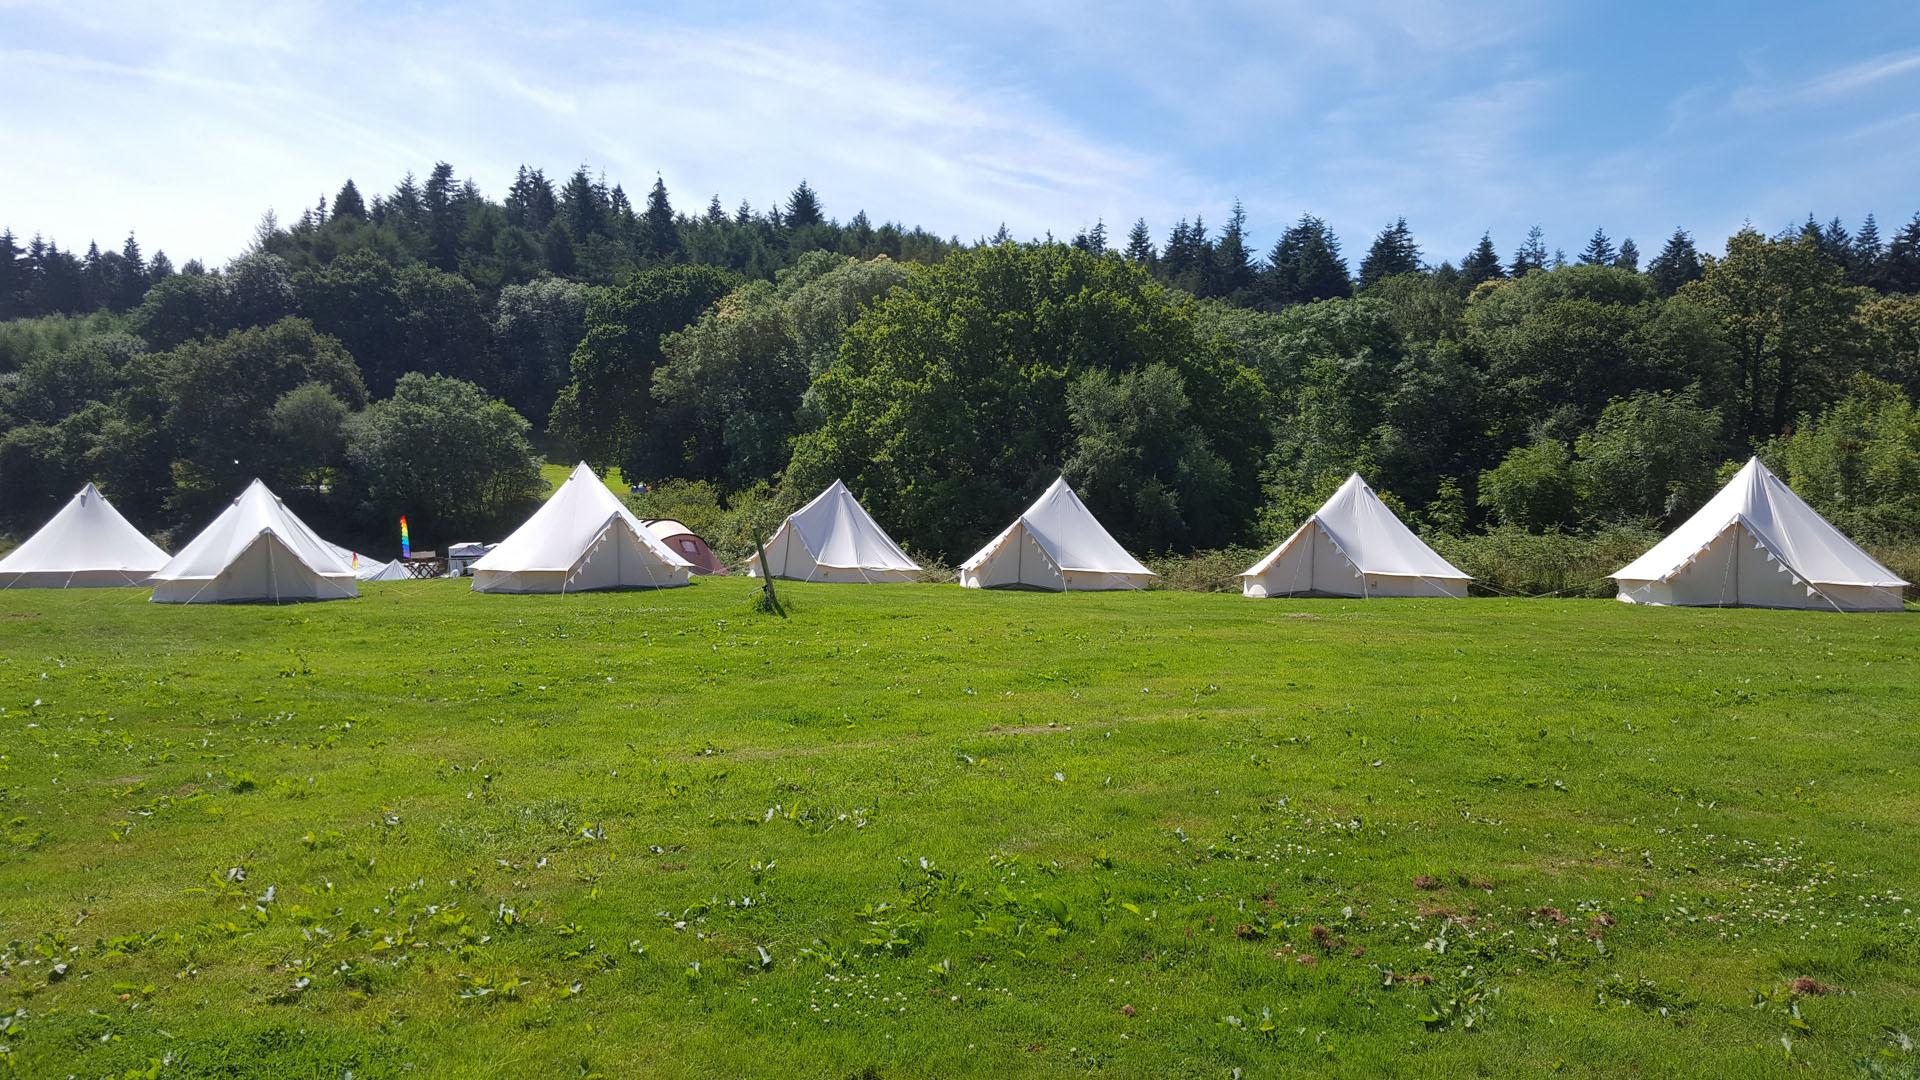 bell-tents-partyfield-venue-dorset.jpg